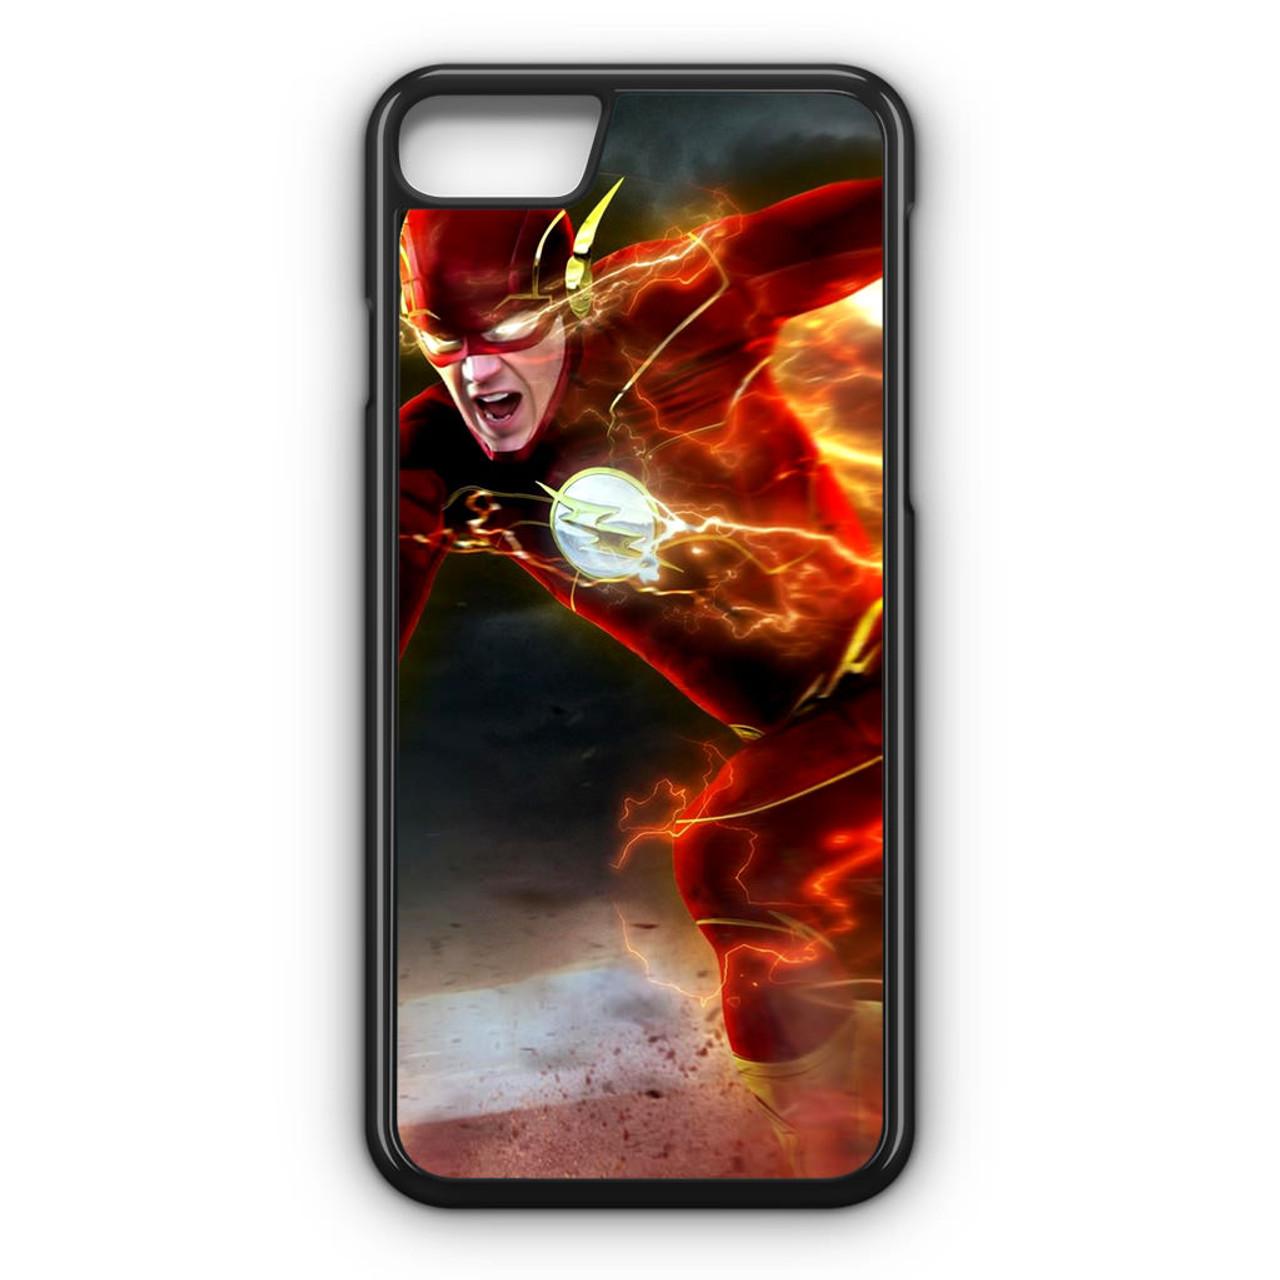 sale retailer 95f79 2c297 Barry Allen The Flash iPhone 8 Case